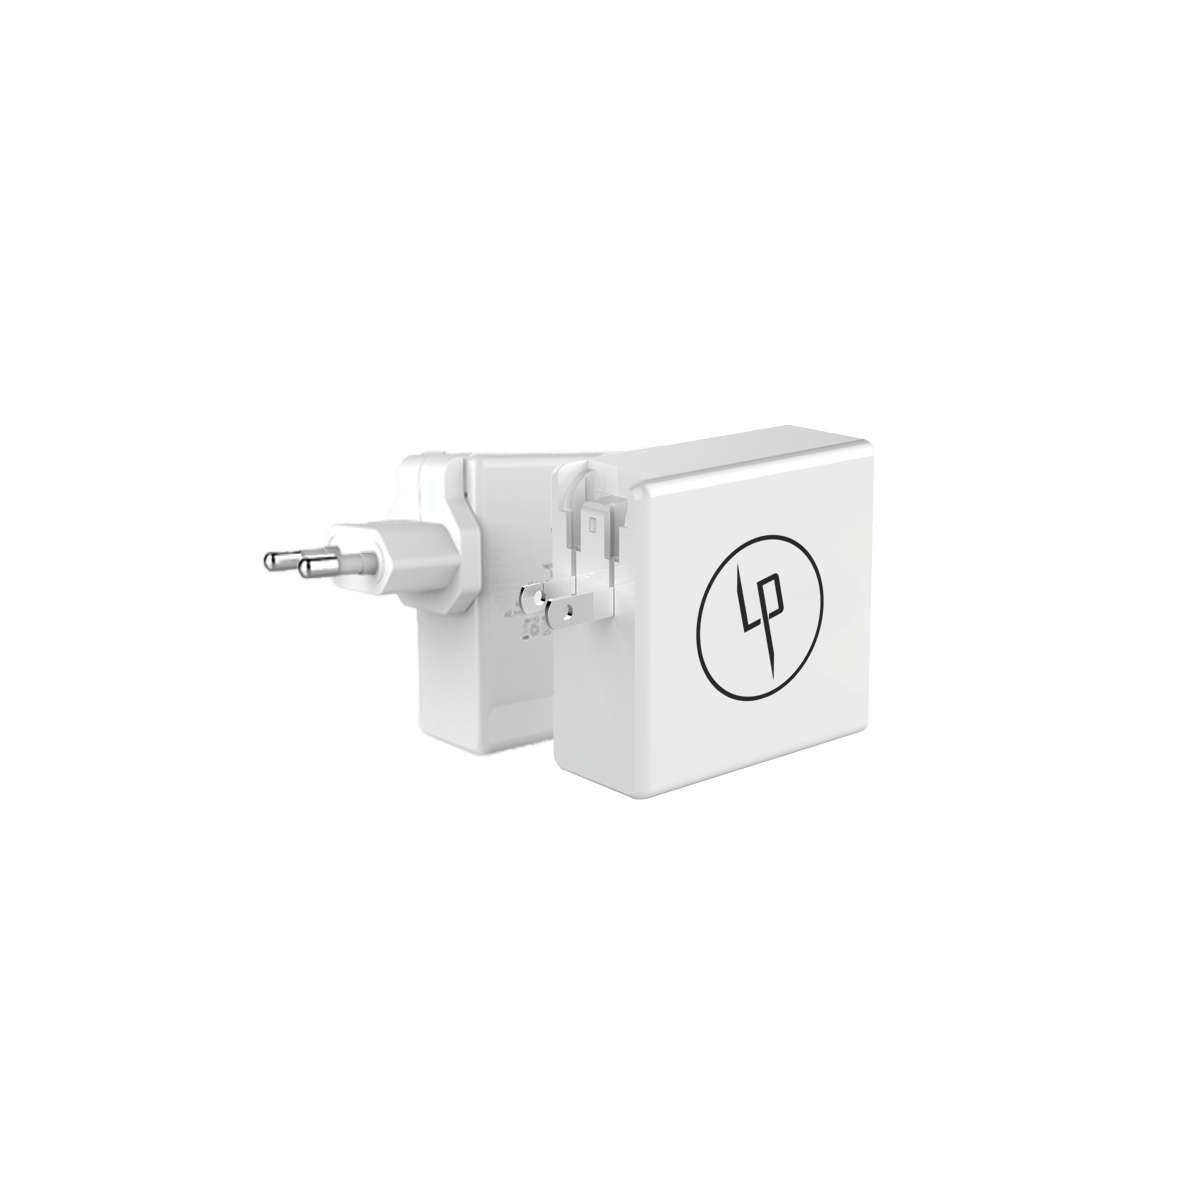 LIFEPOWR 65W USB C och QC 3,0 laddare MacBook Pro laddare